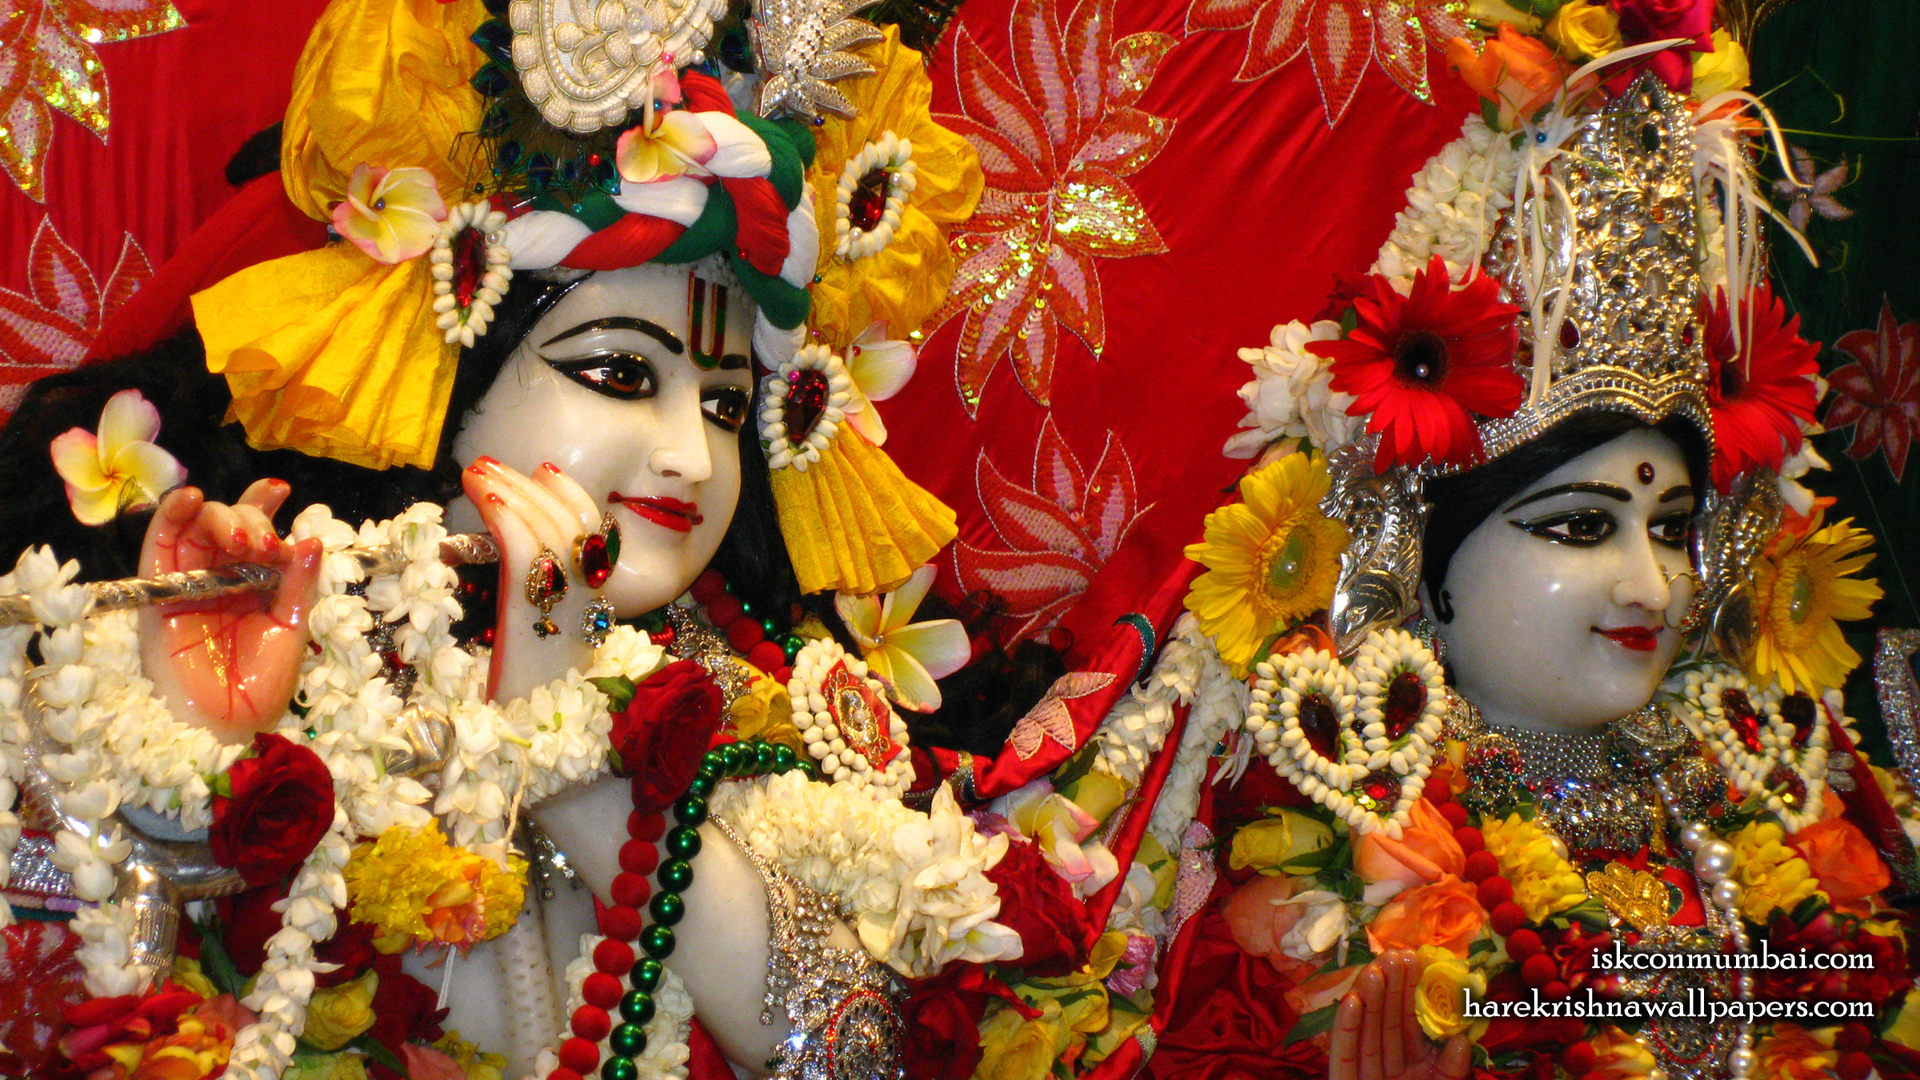 Sri Sri Radha Rasabihari Close up Wallpaper (026) Size 1920x1080 Download